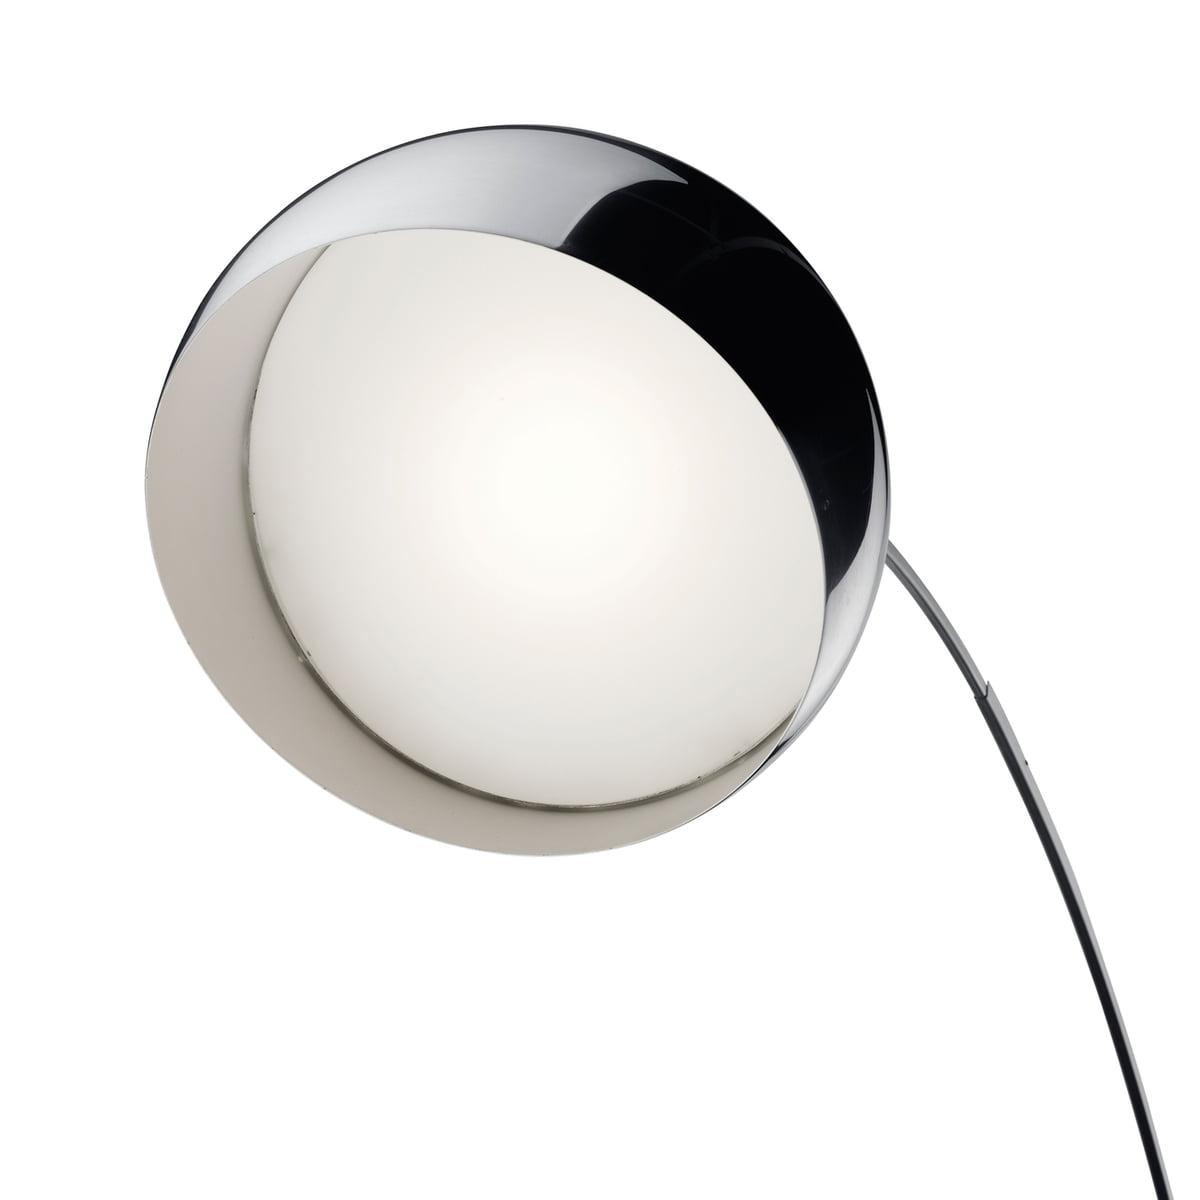 Flos-Arco-LED-Stehleuchte-Edelstahl-Marmor-weiss-detial-Leuchtschirm